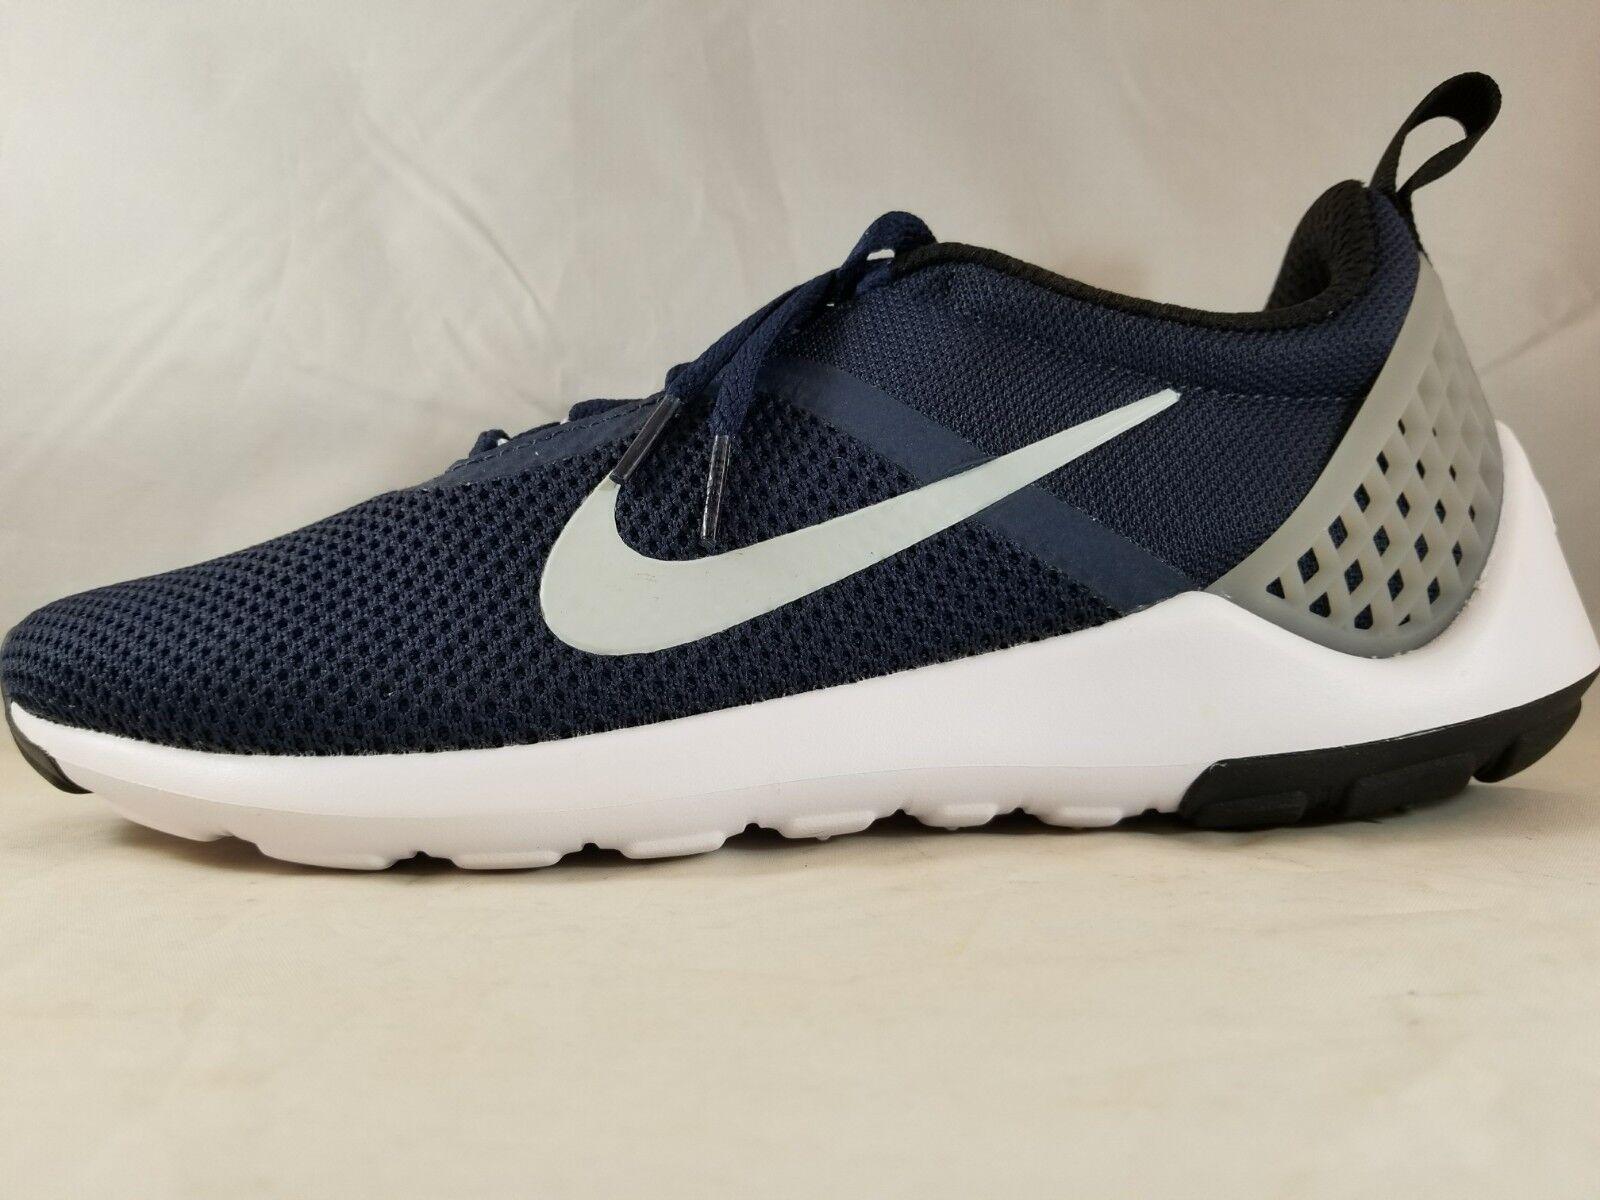 Nike lunarestoa laufschuh 2 wesentlichen mens laufschuh lunarestoa 811372 400  9,5 af4dd4